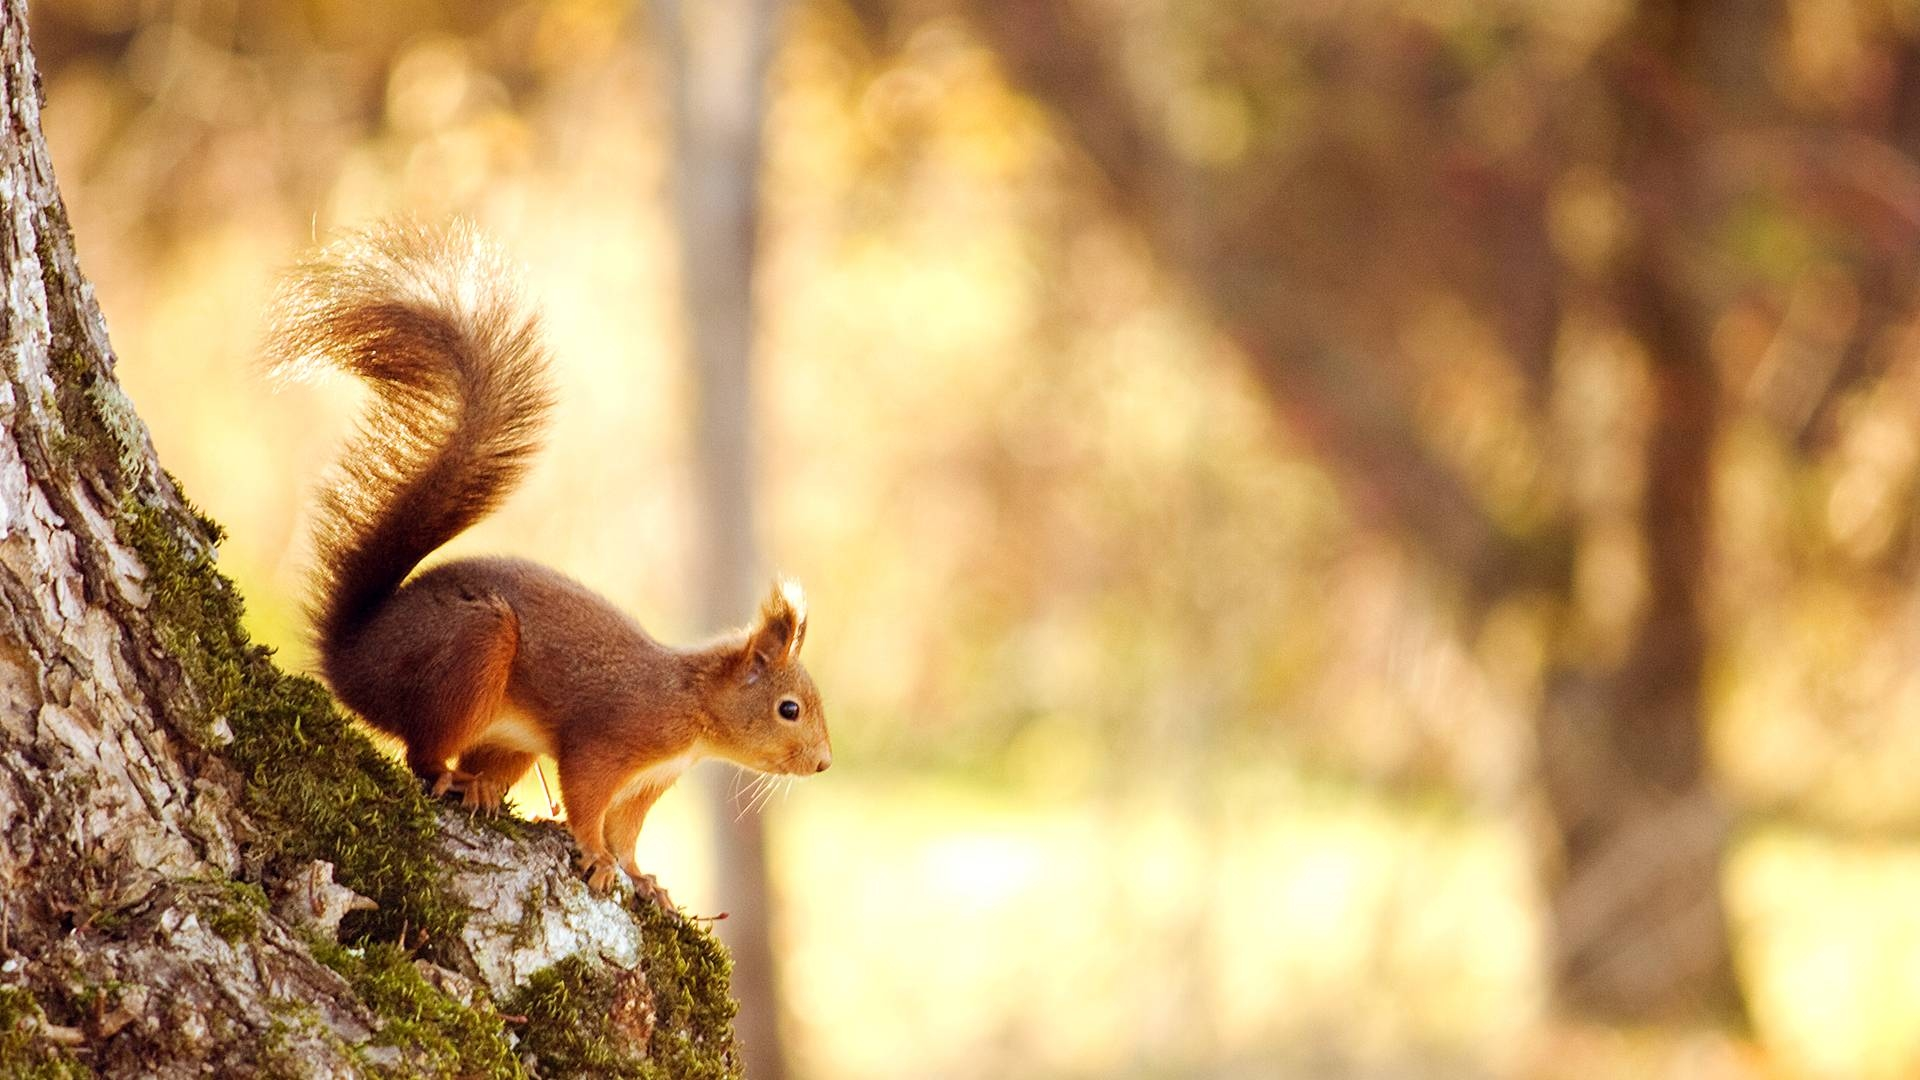 Animals in Spring Desktop Wallpaper - WallpaperSafari